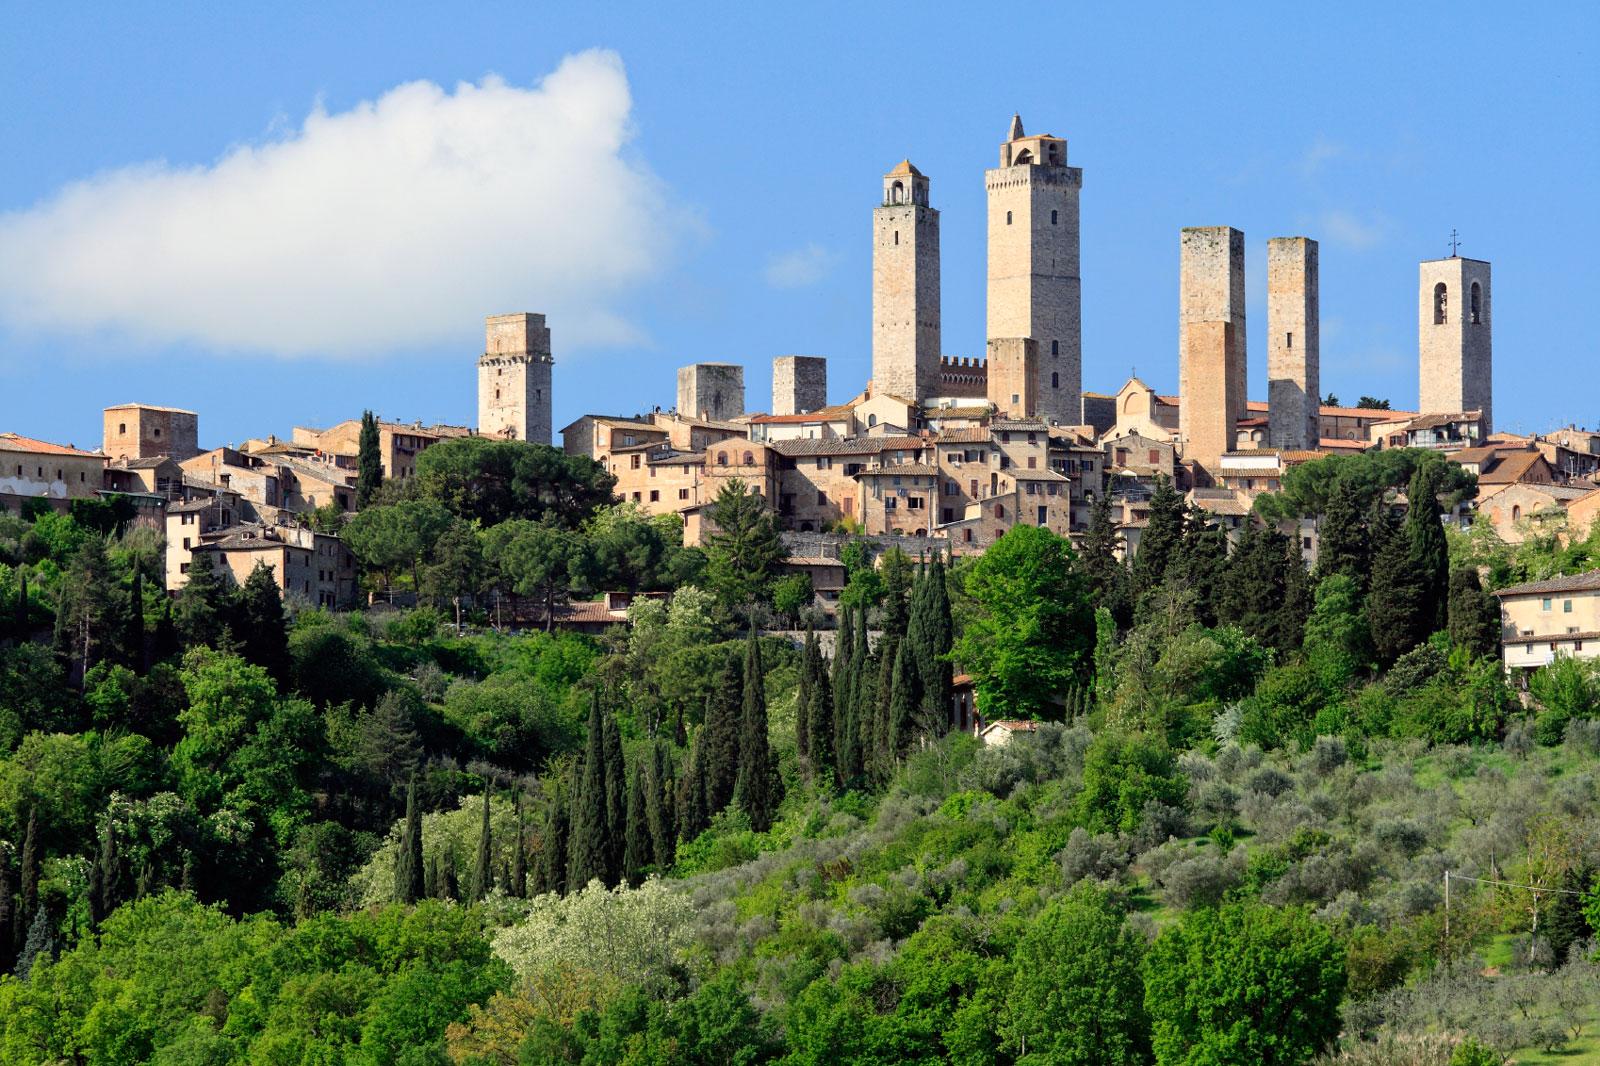 View on San Gimignano